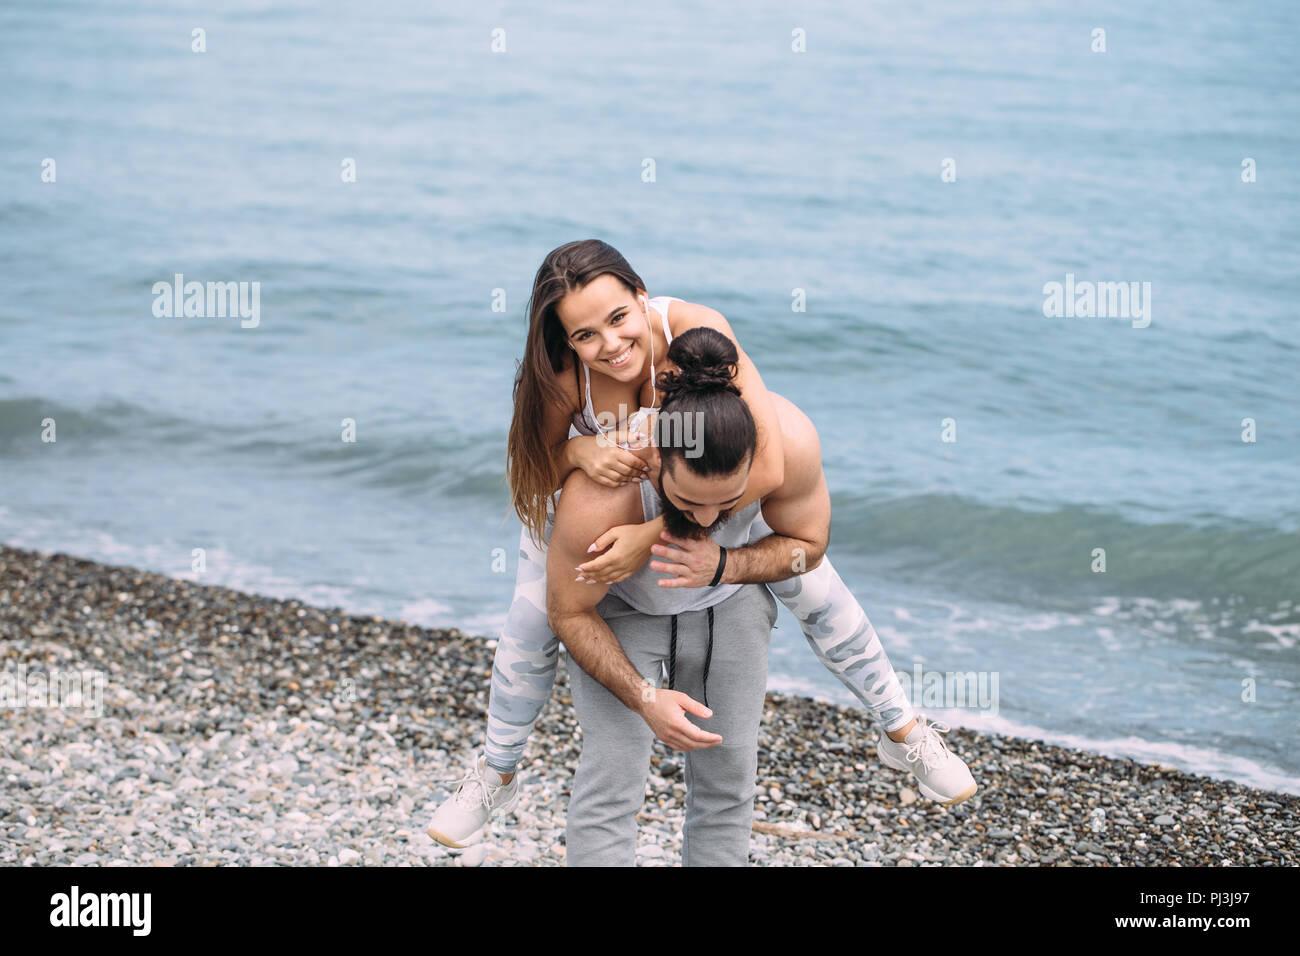 Playful sportive men giving piggyback ride to women on beach. - Stock Image